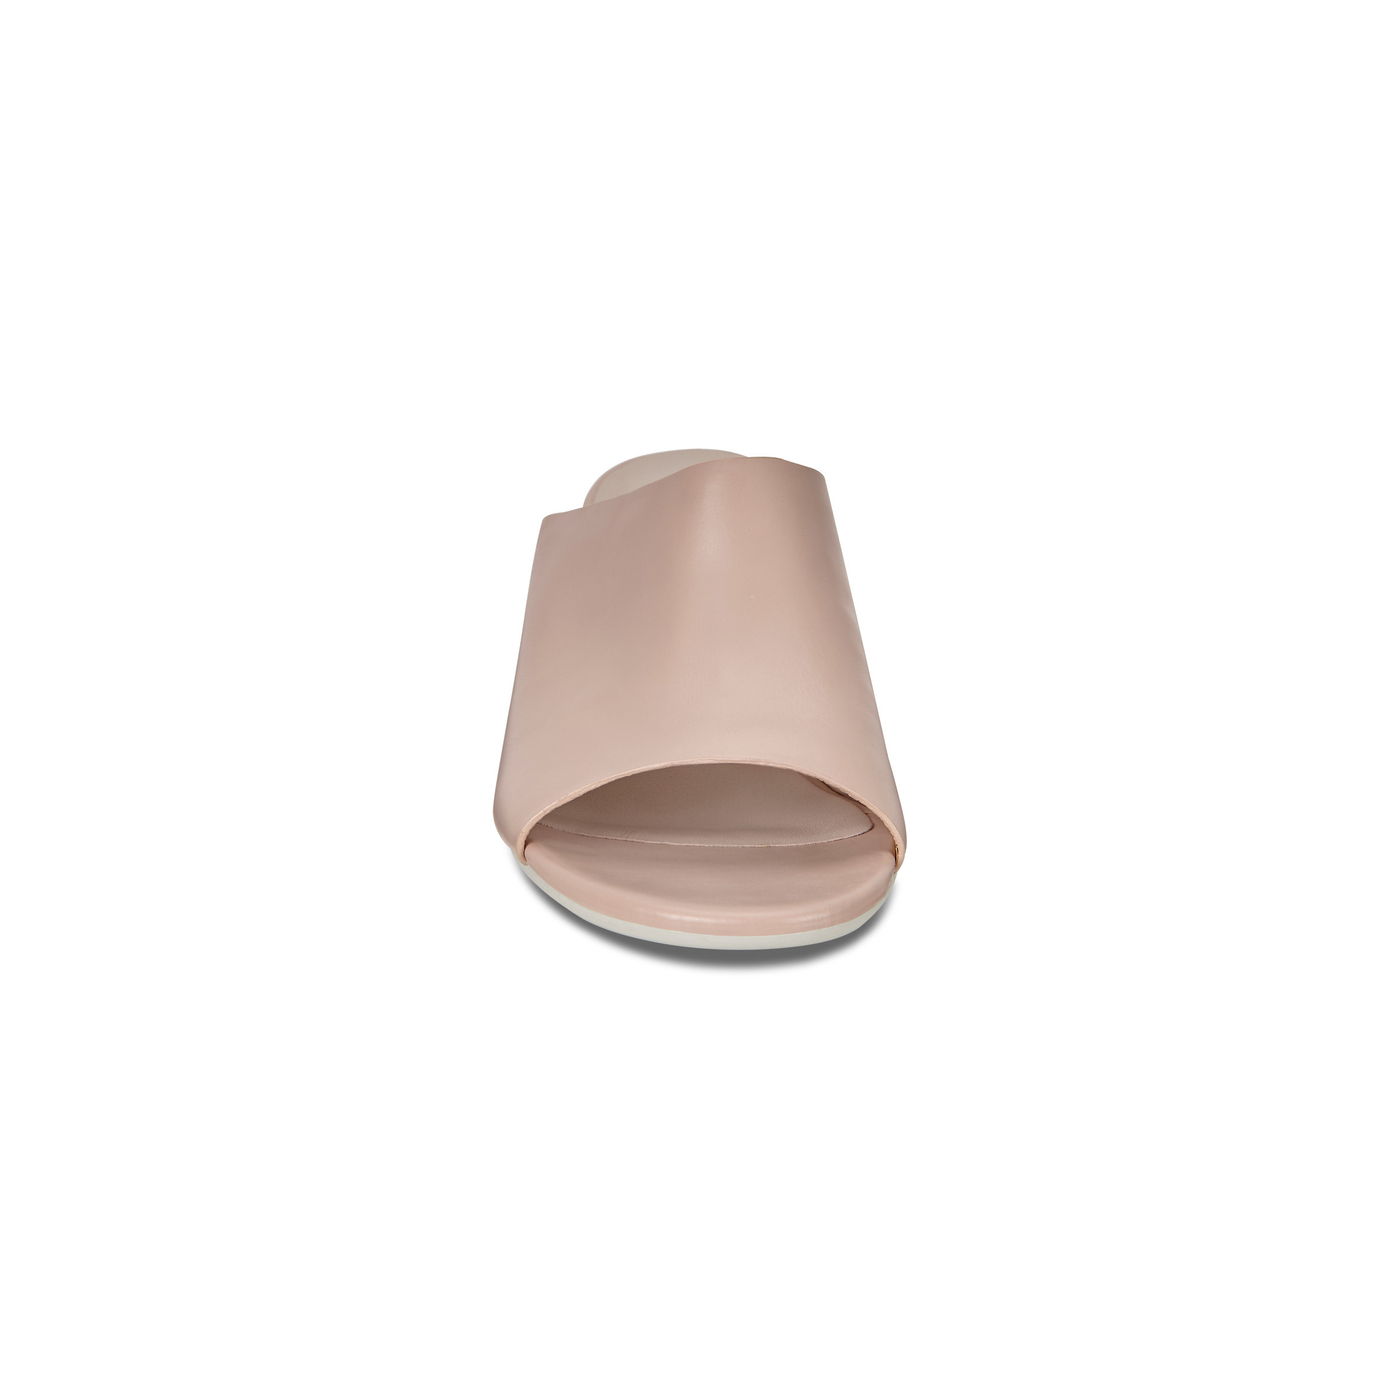 ECCO SHAPE SLEEK SANDAL Mule 65mm